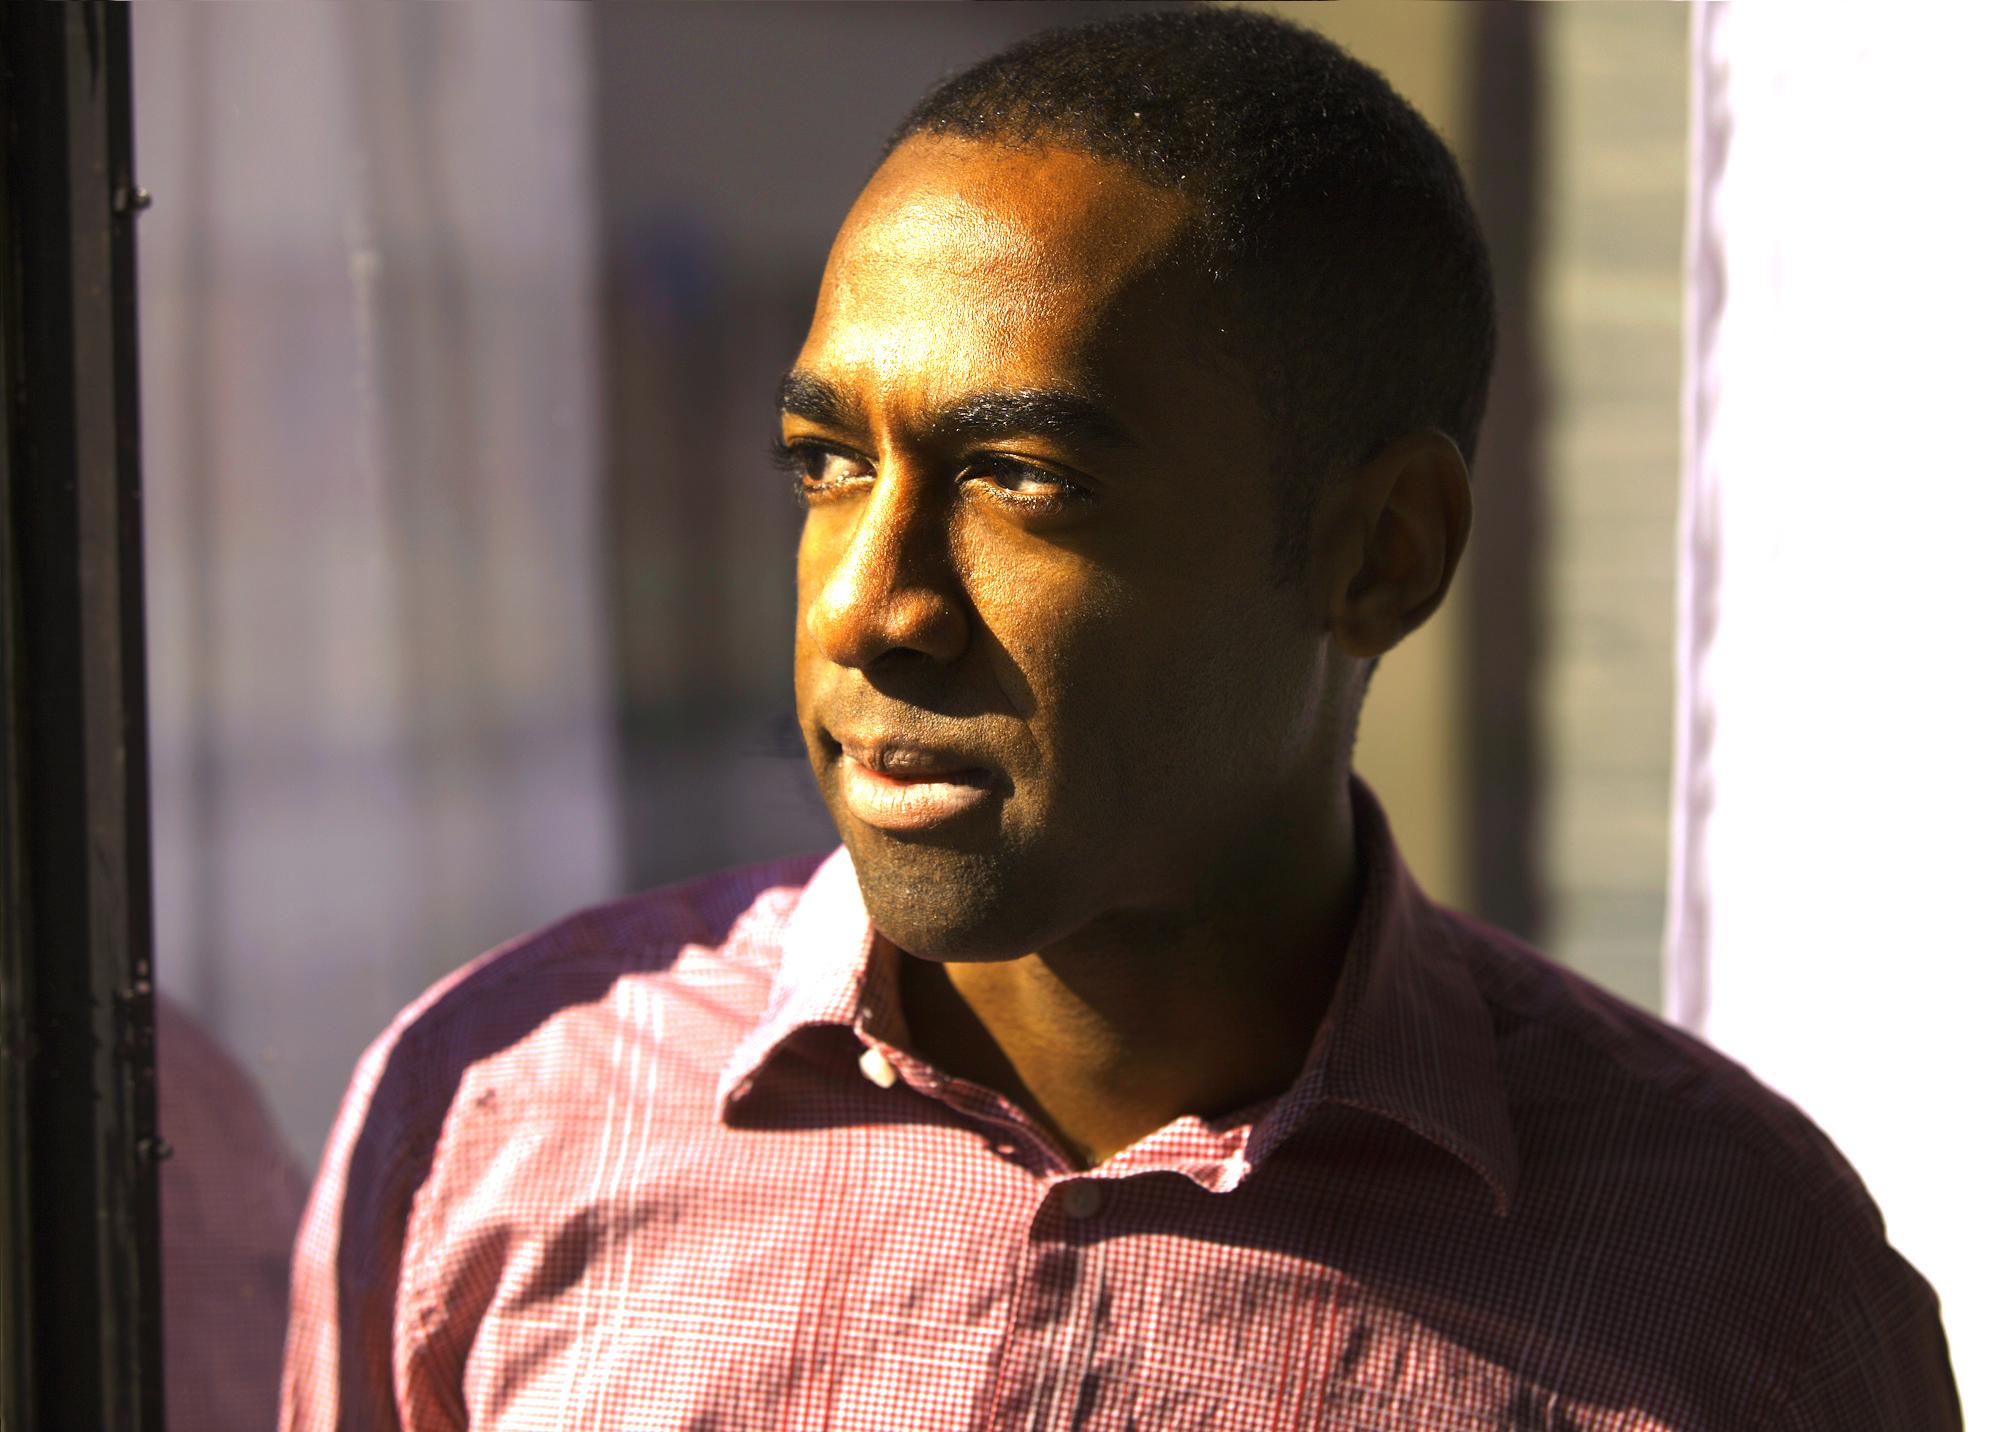 Photograph of author Ian Williams